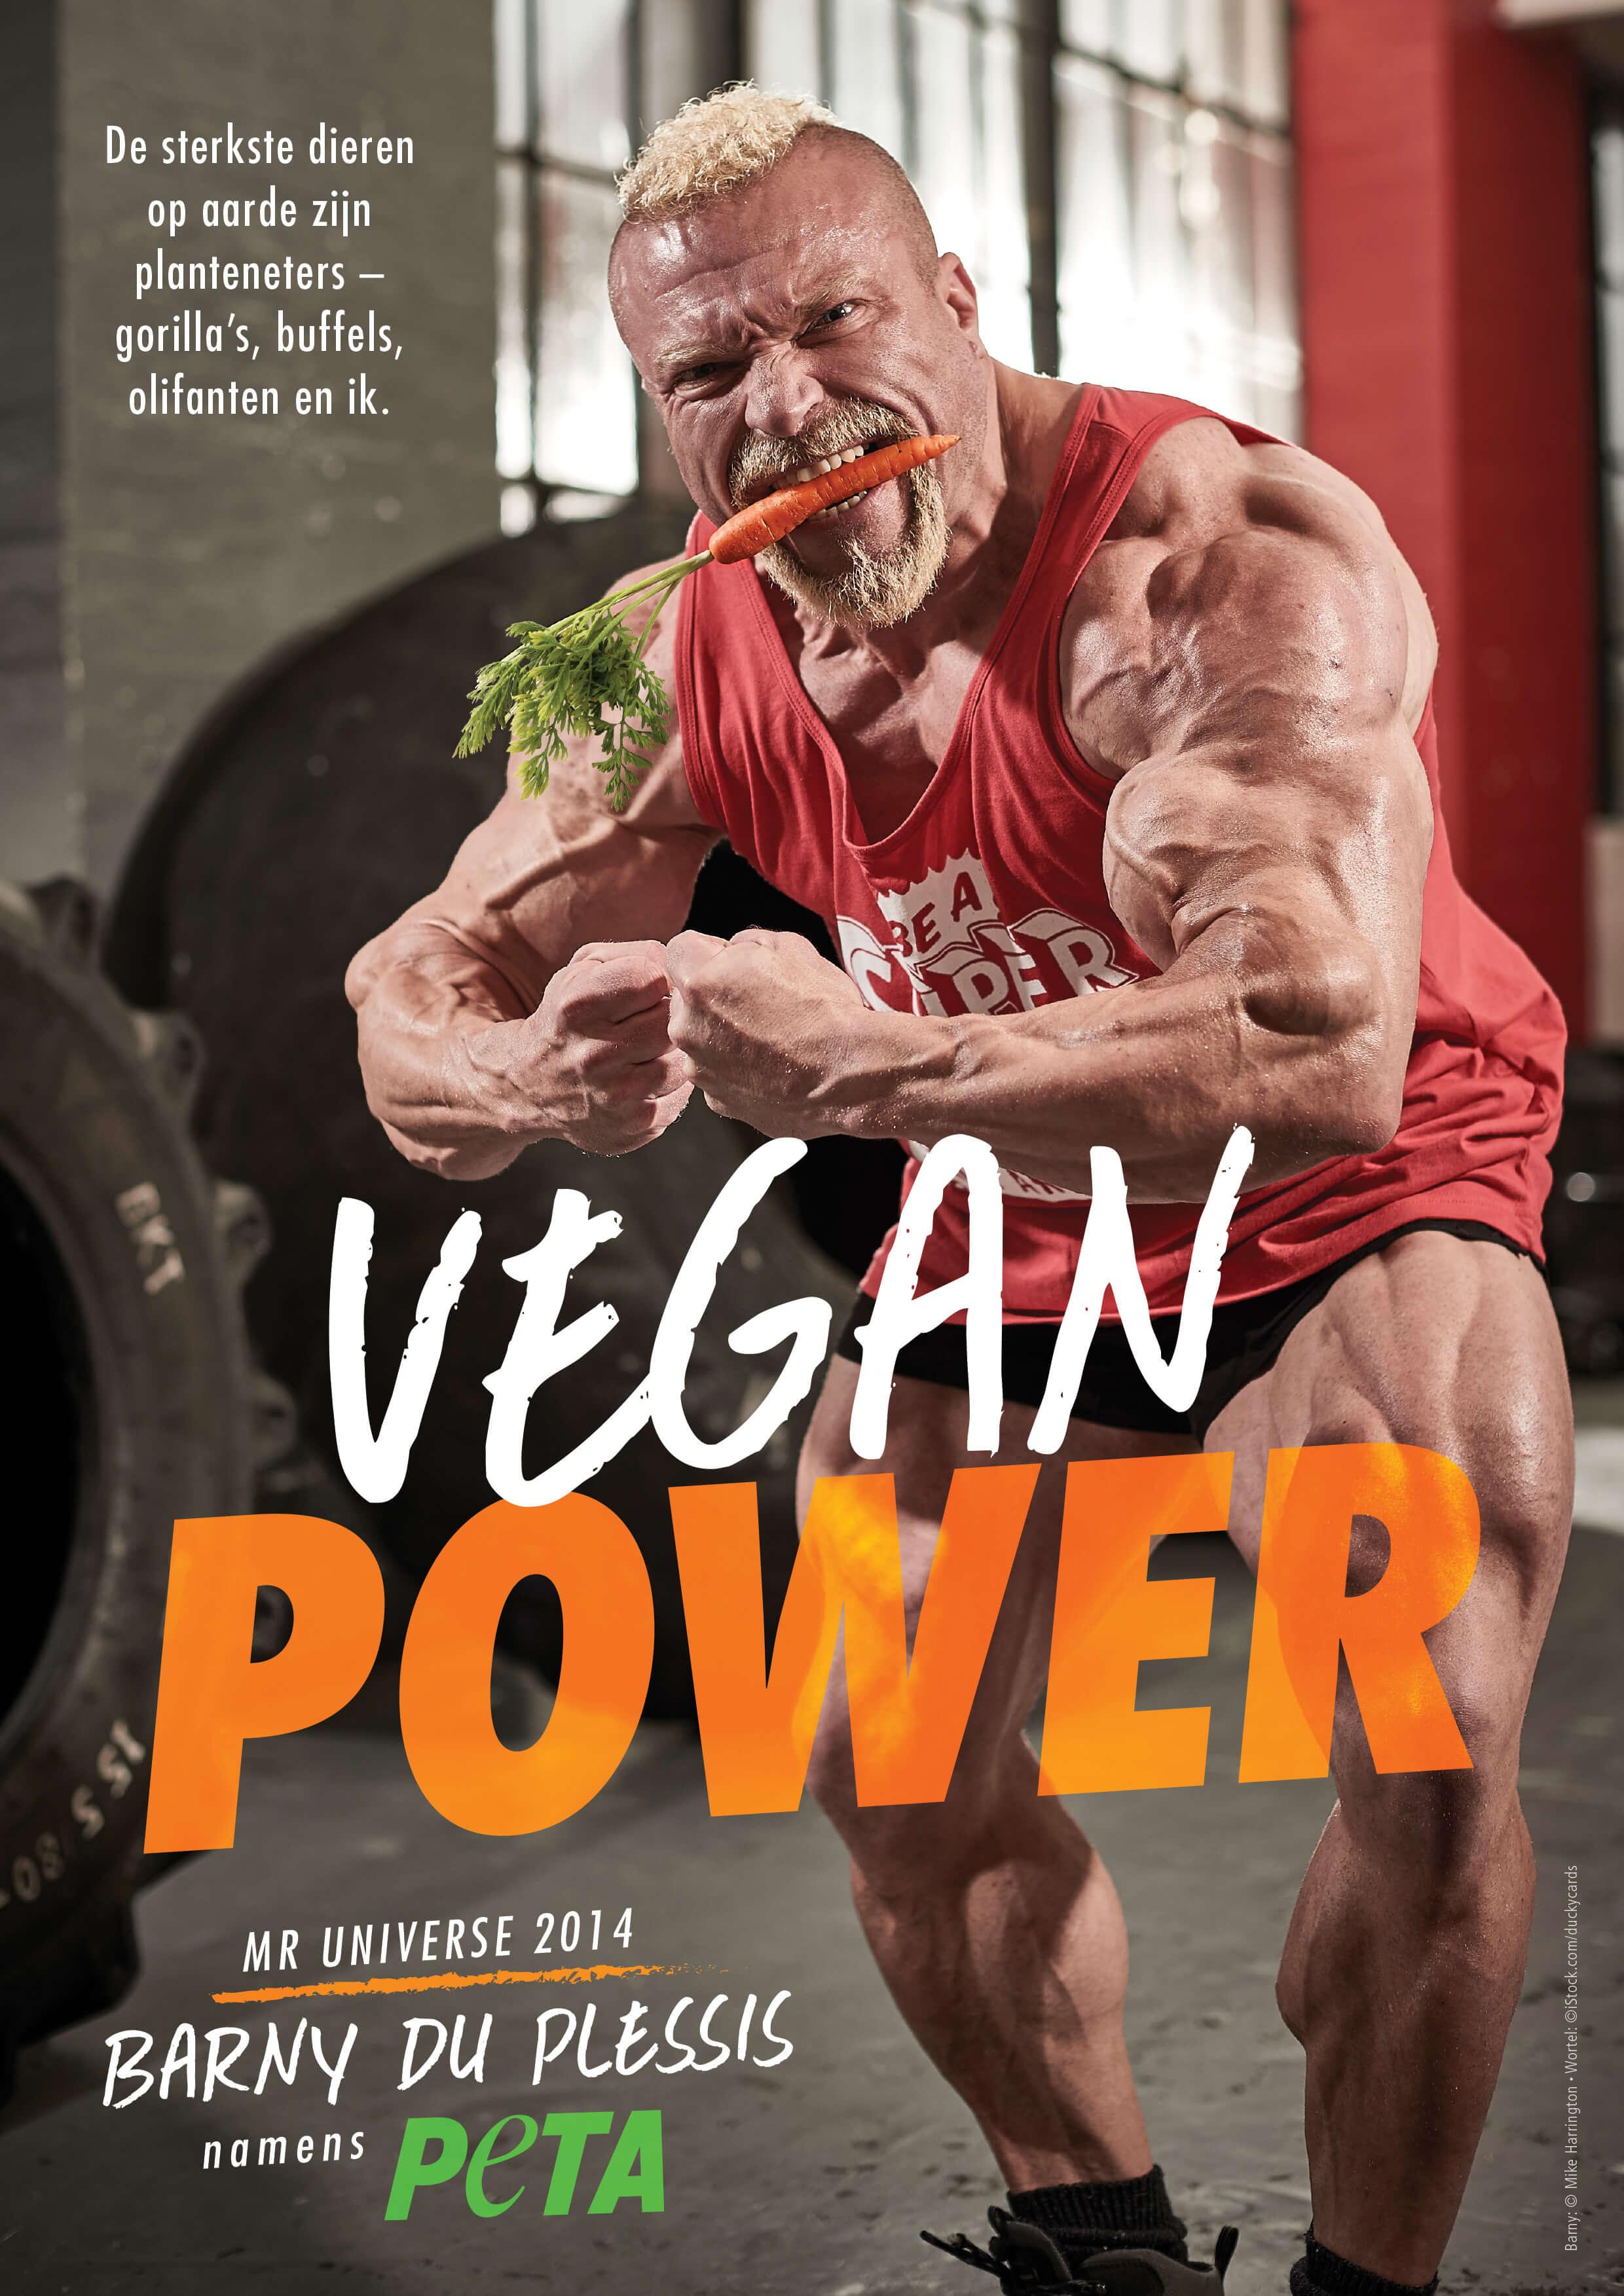 Vegan Power: Mr Universe is sterker zonder vlees